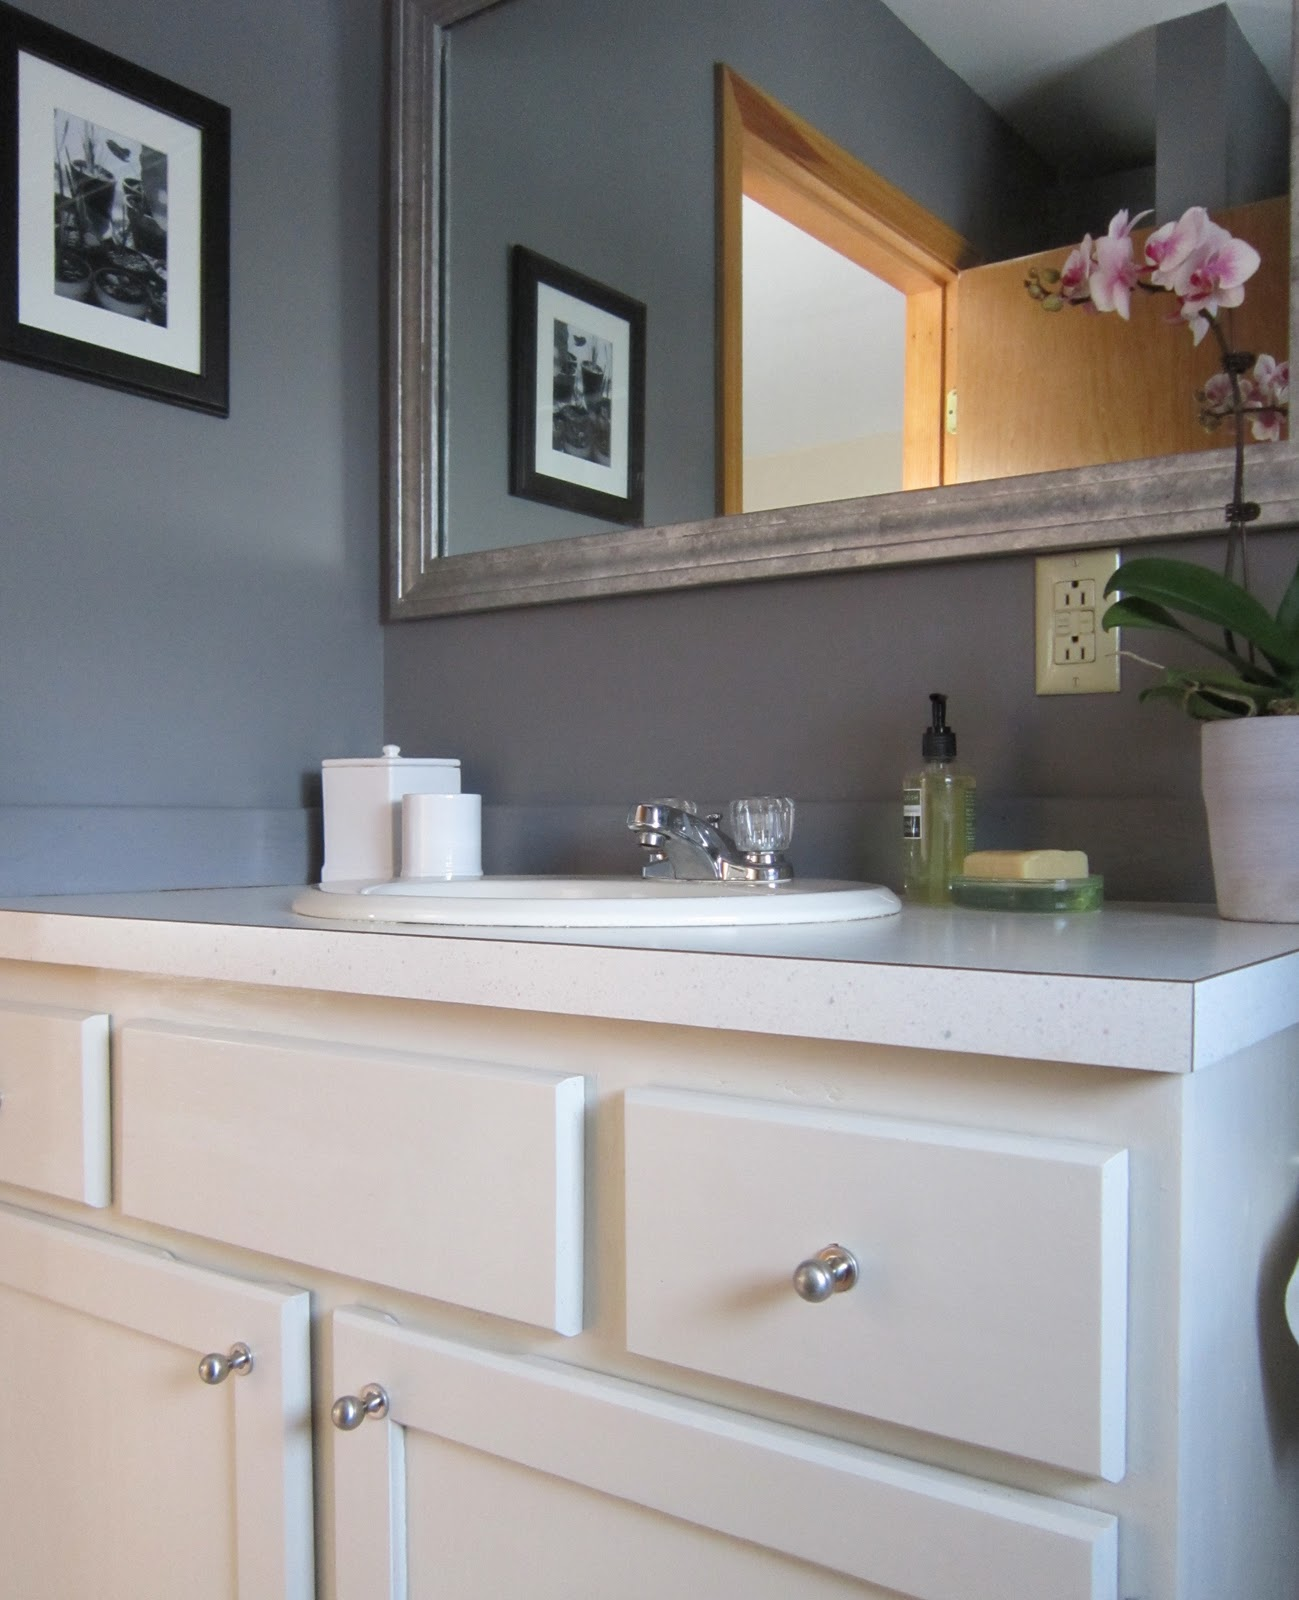 Bathroom Paint: Design Megillah: Bathroom Redesign For Under $200